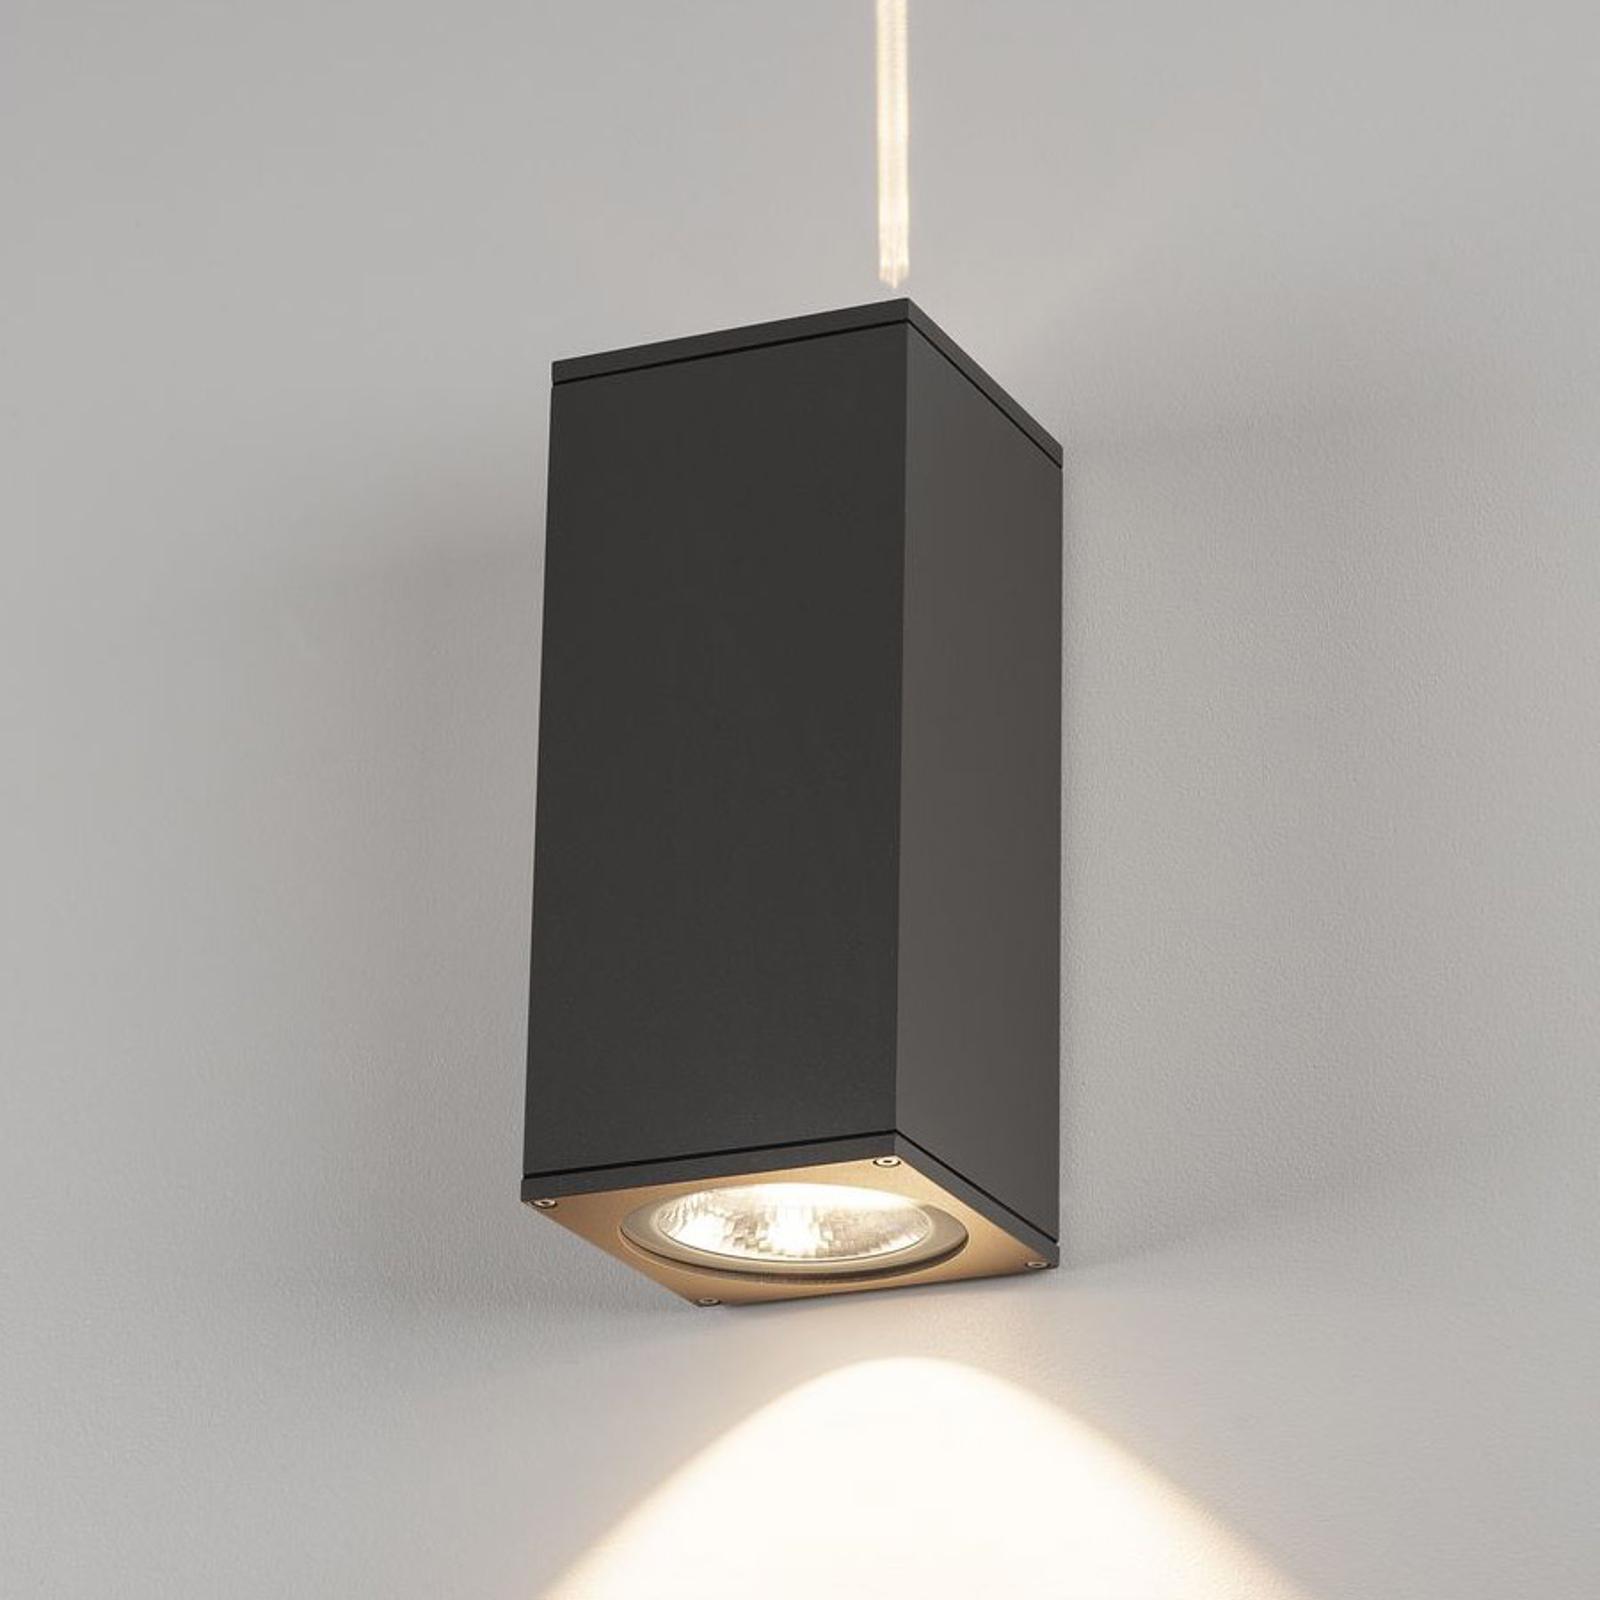 SLV Big Theo LED-Außenwandleuchte, anthrazit